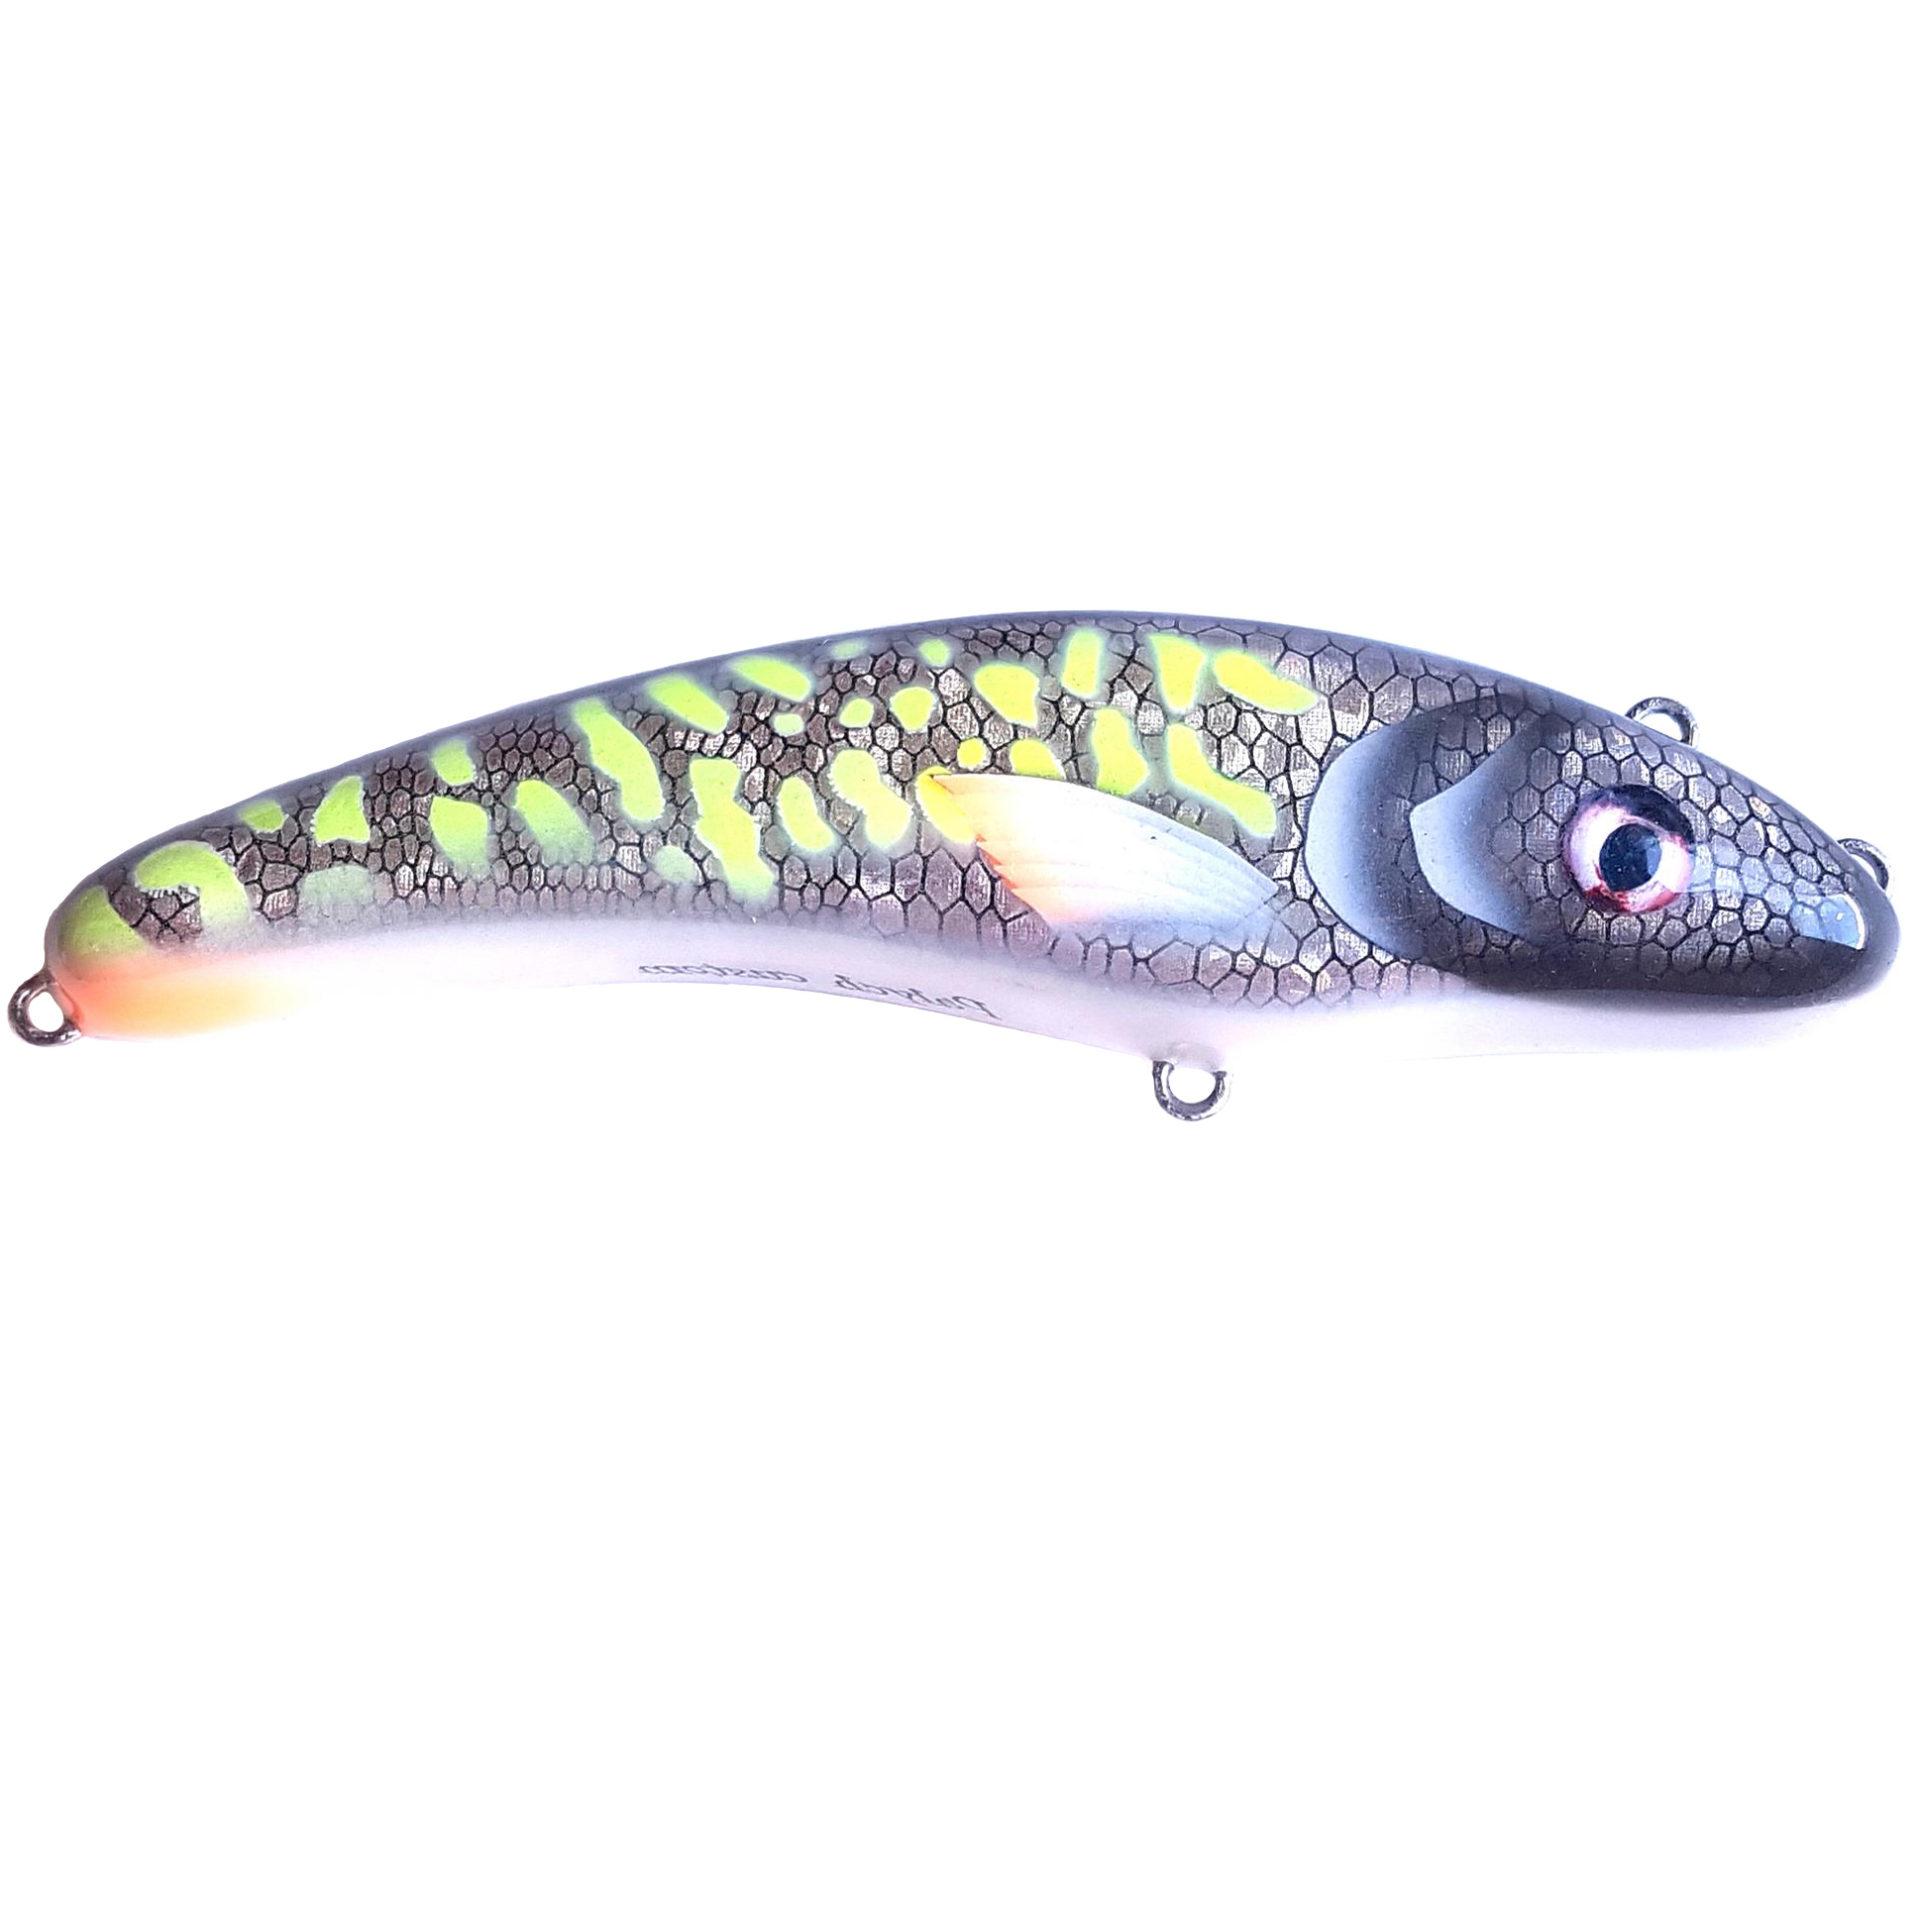 Palych Custom Sea Dog Sea Pike